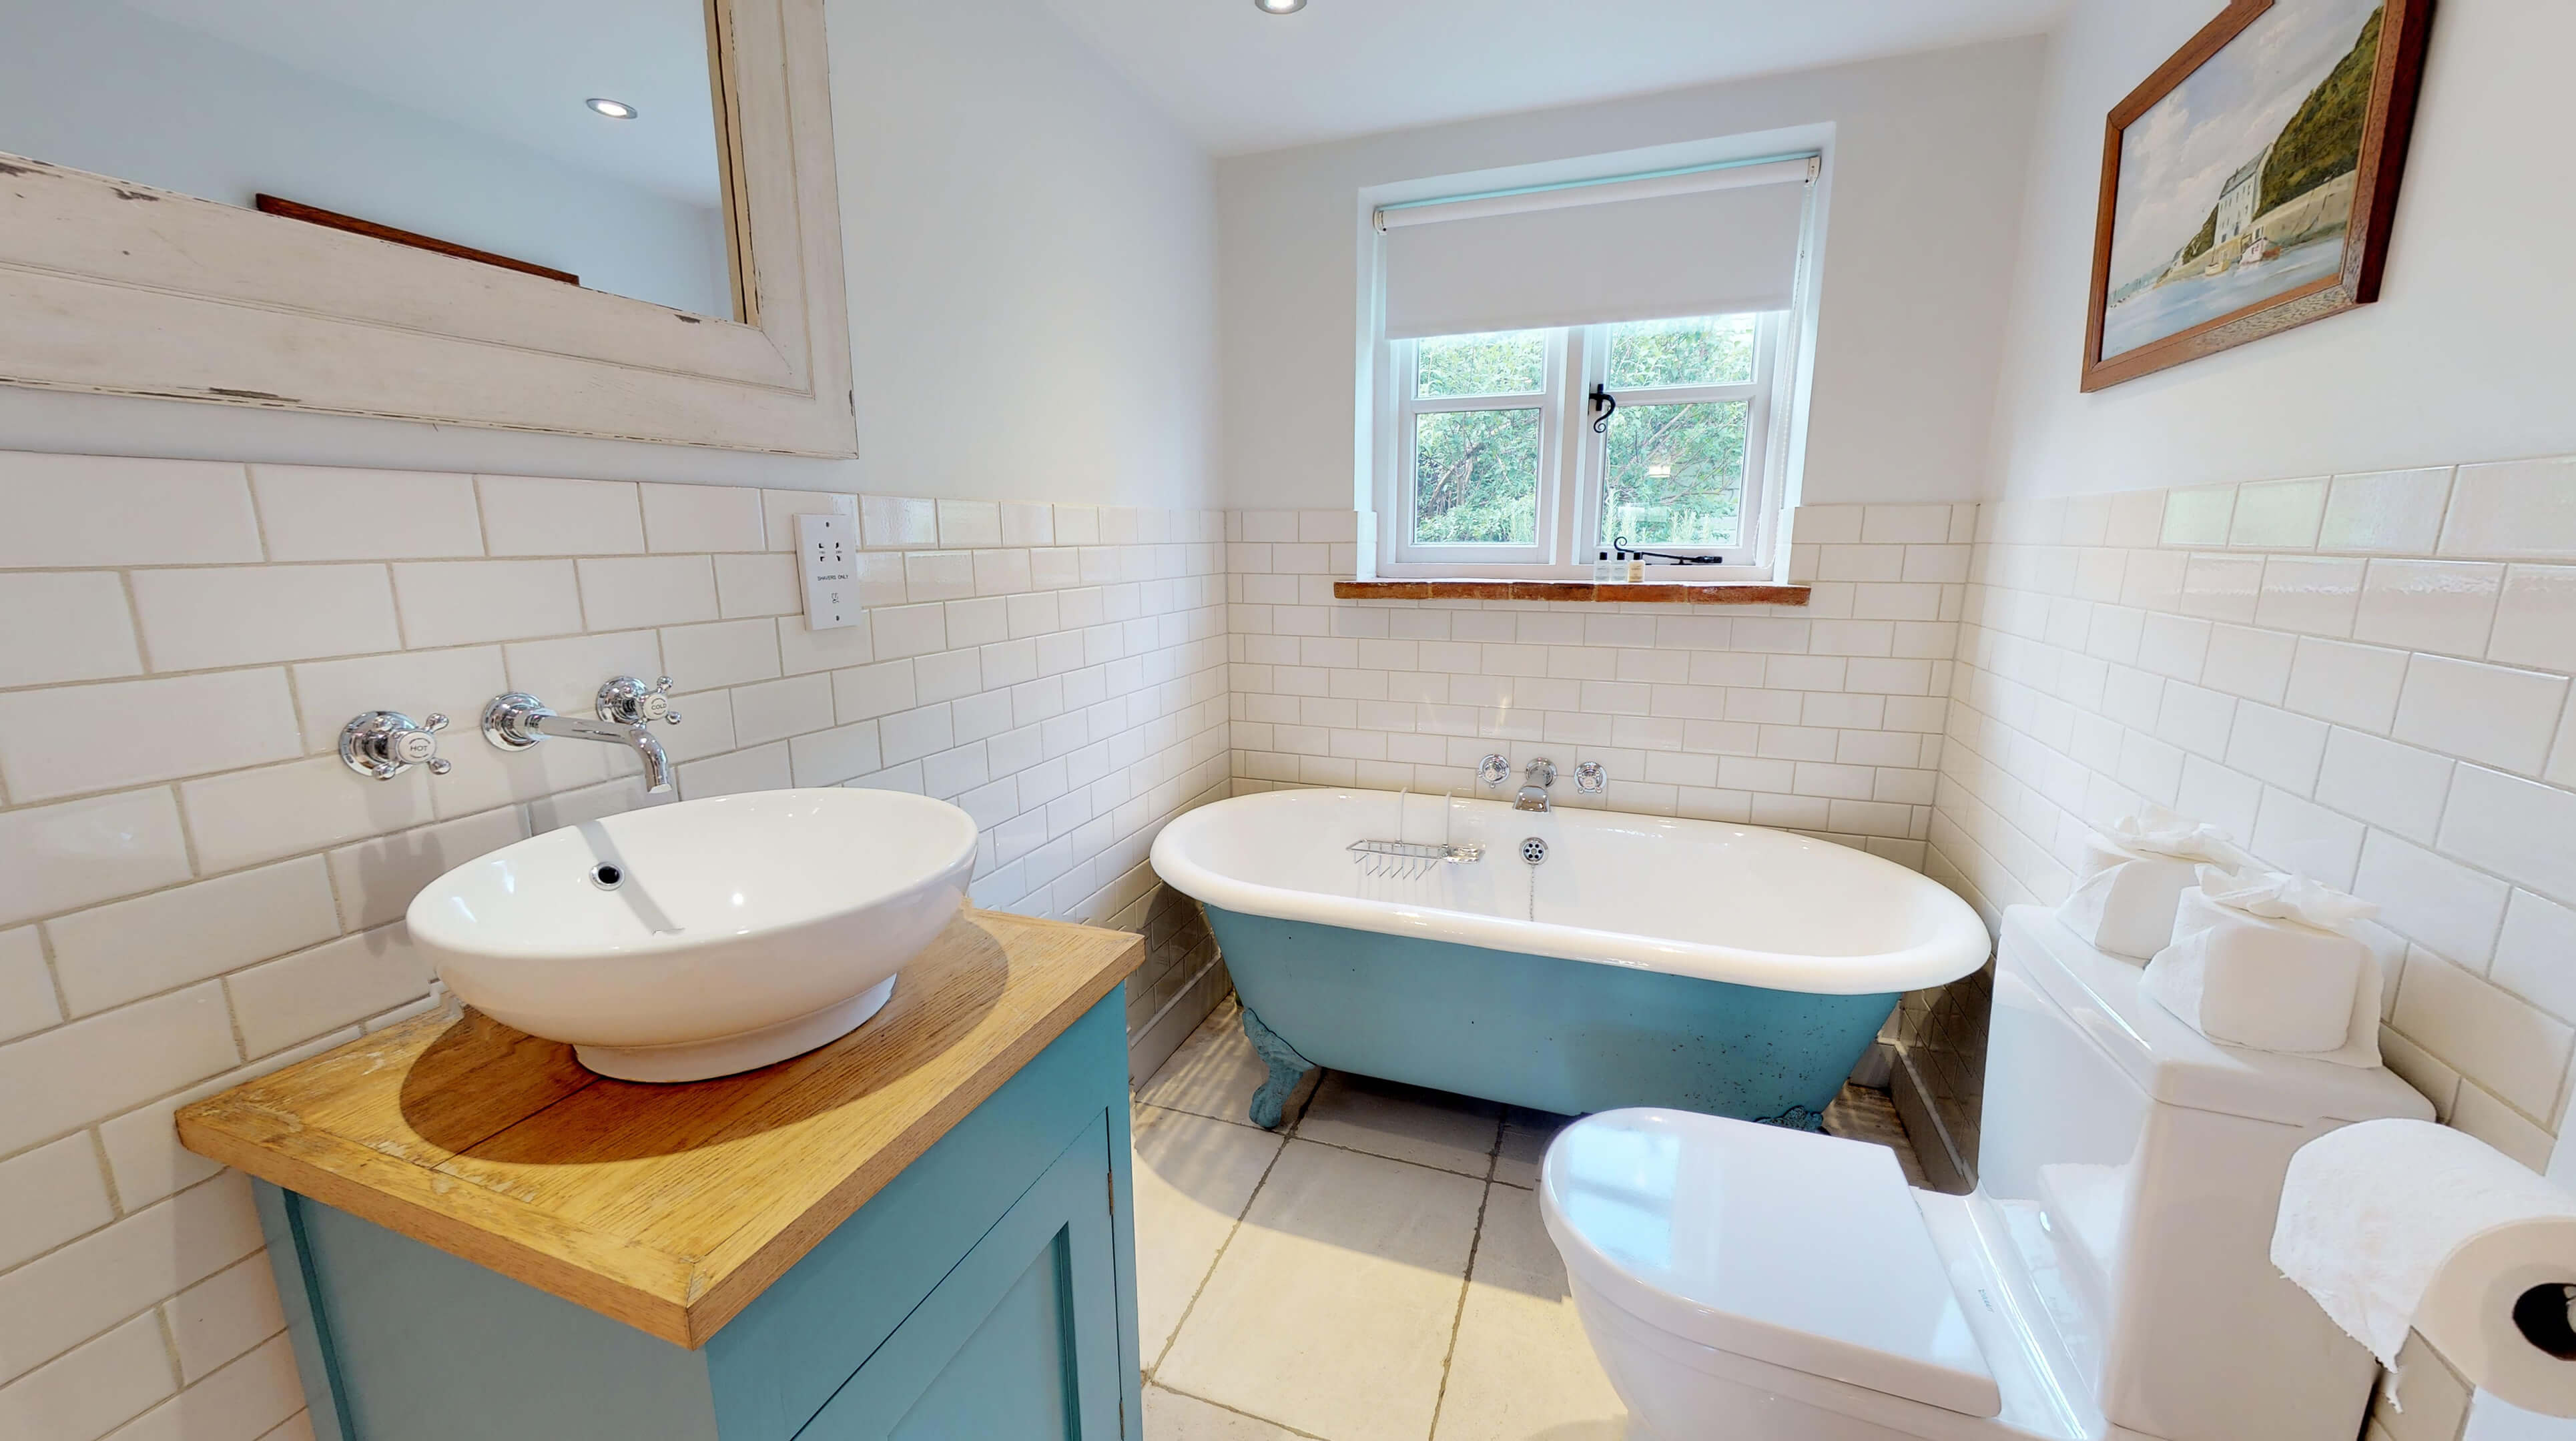 Lower Heyford Three Bedroom Coopers Cottage Bathroom 1